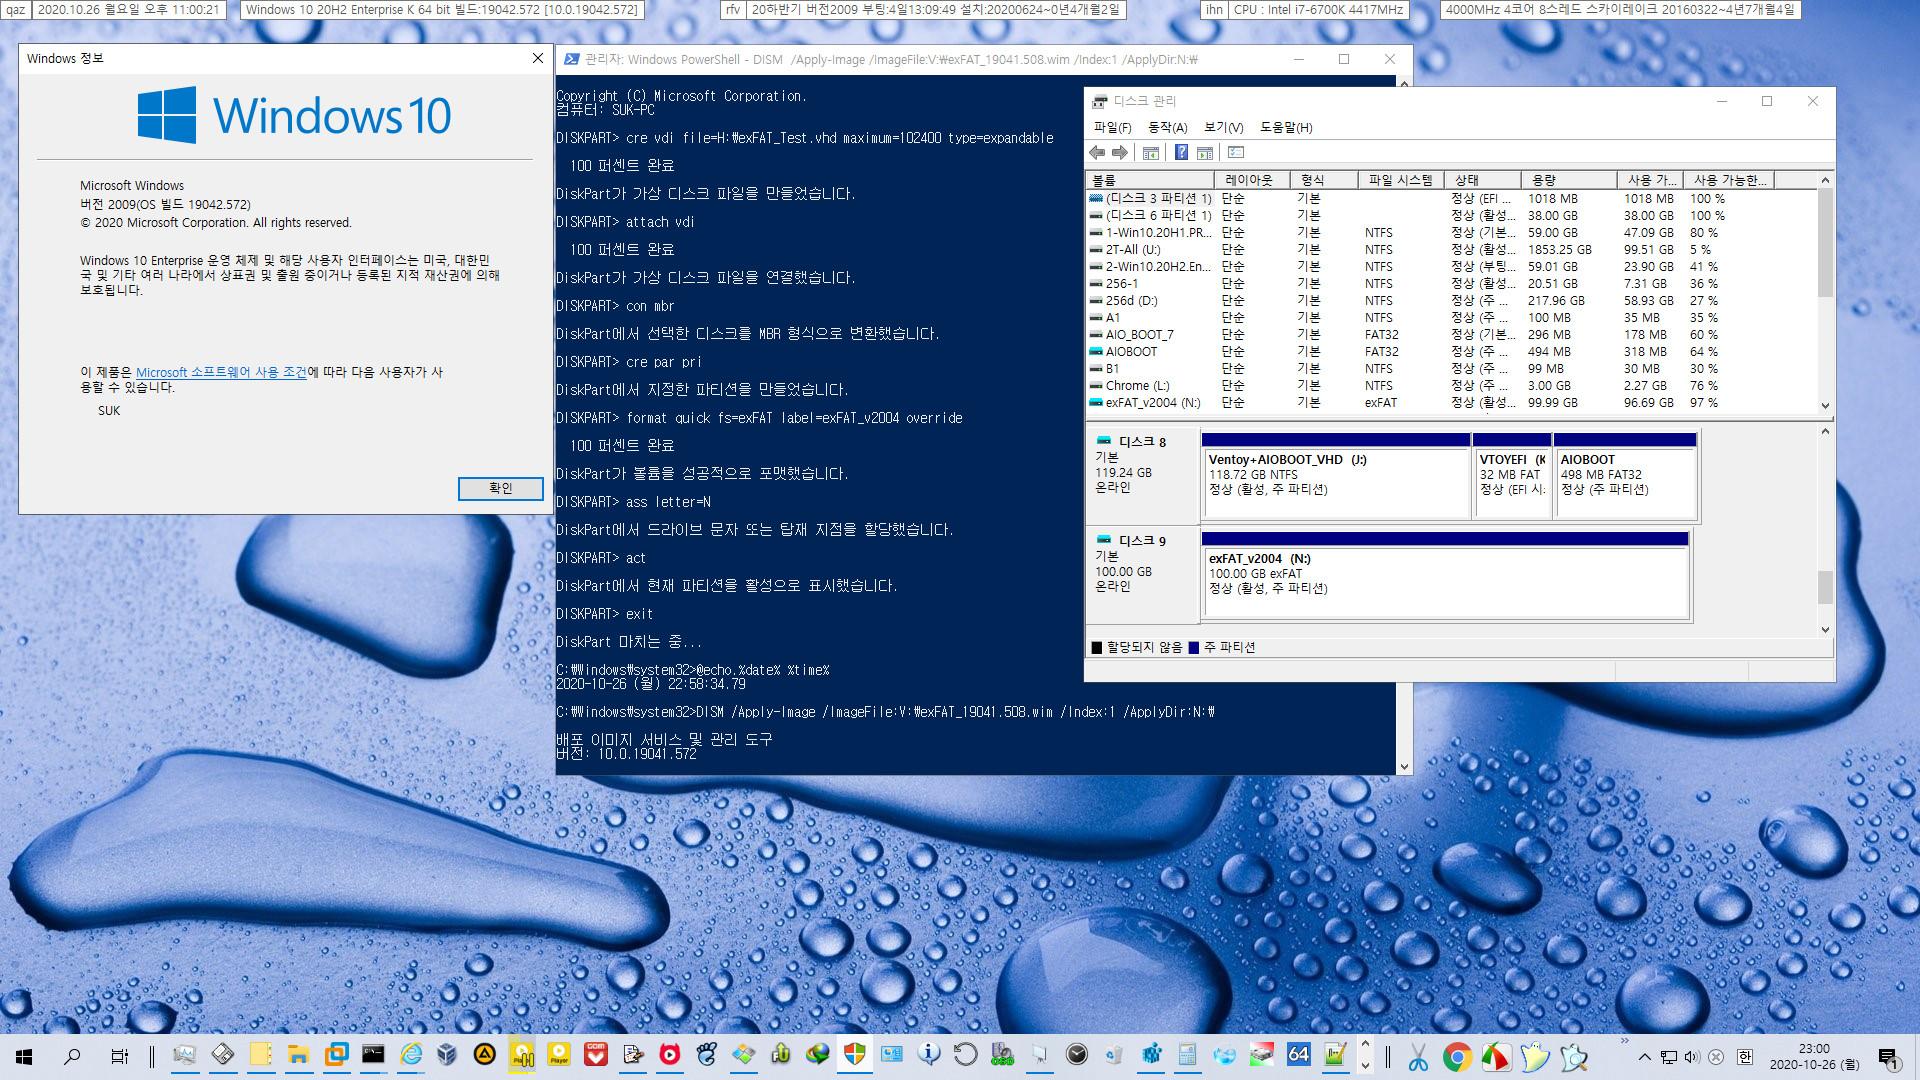 exFAT 포맷으로도 VHD 부팅이 Windows 10 버전 1903부터 된다고 하여 테스트 - 생고생만 하다가 컴퓨터 먹통 2번이나 되고 그만뒀습니다 2020-10-26_230021.jpg